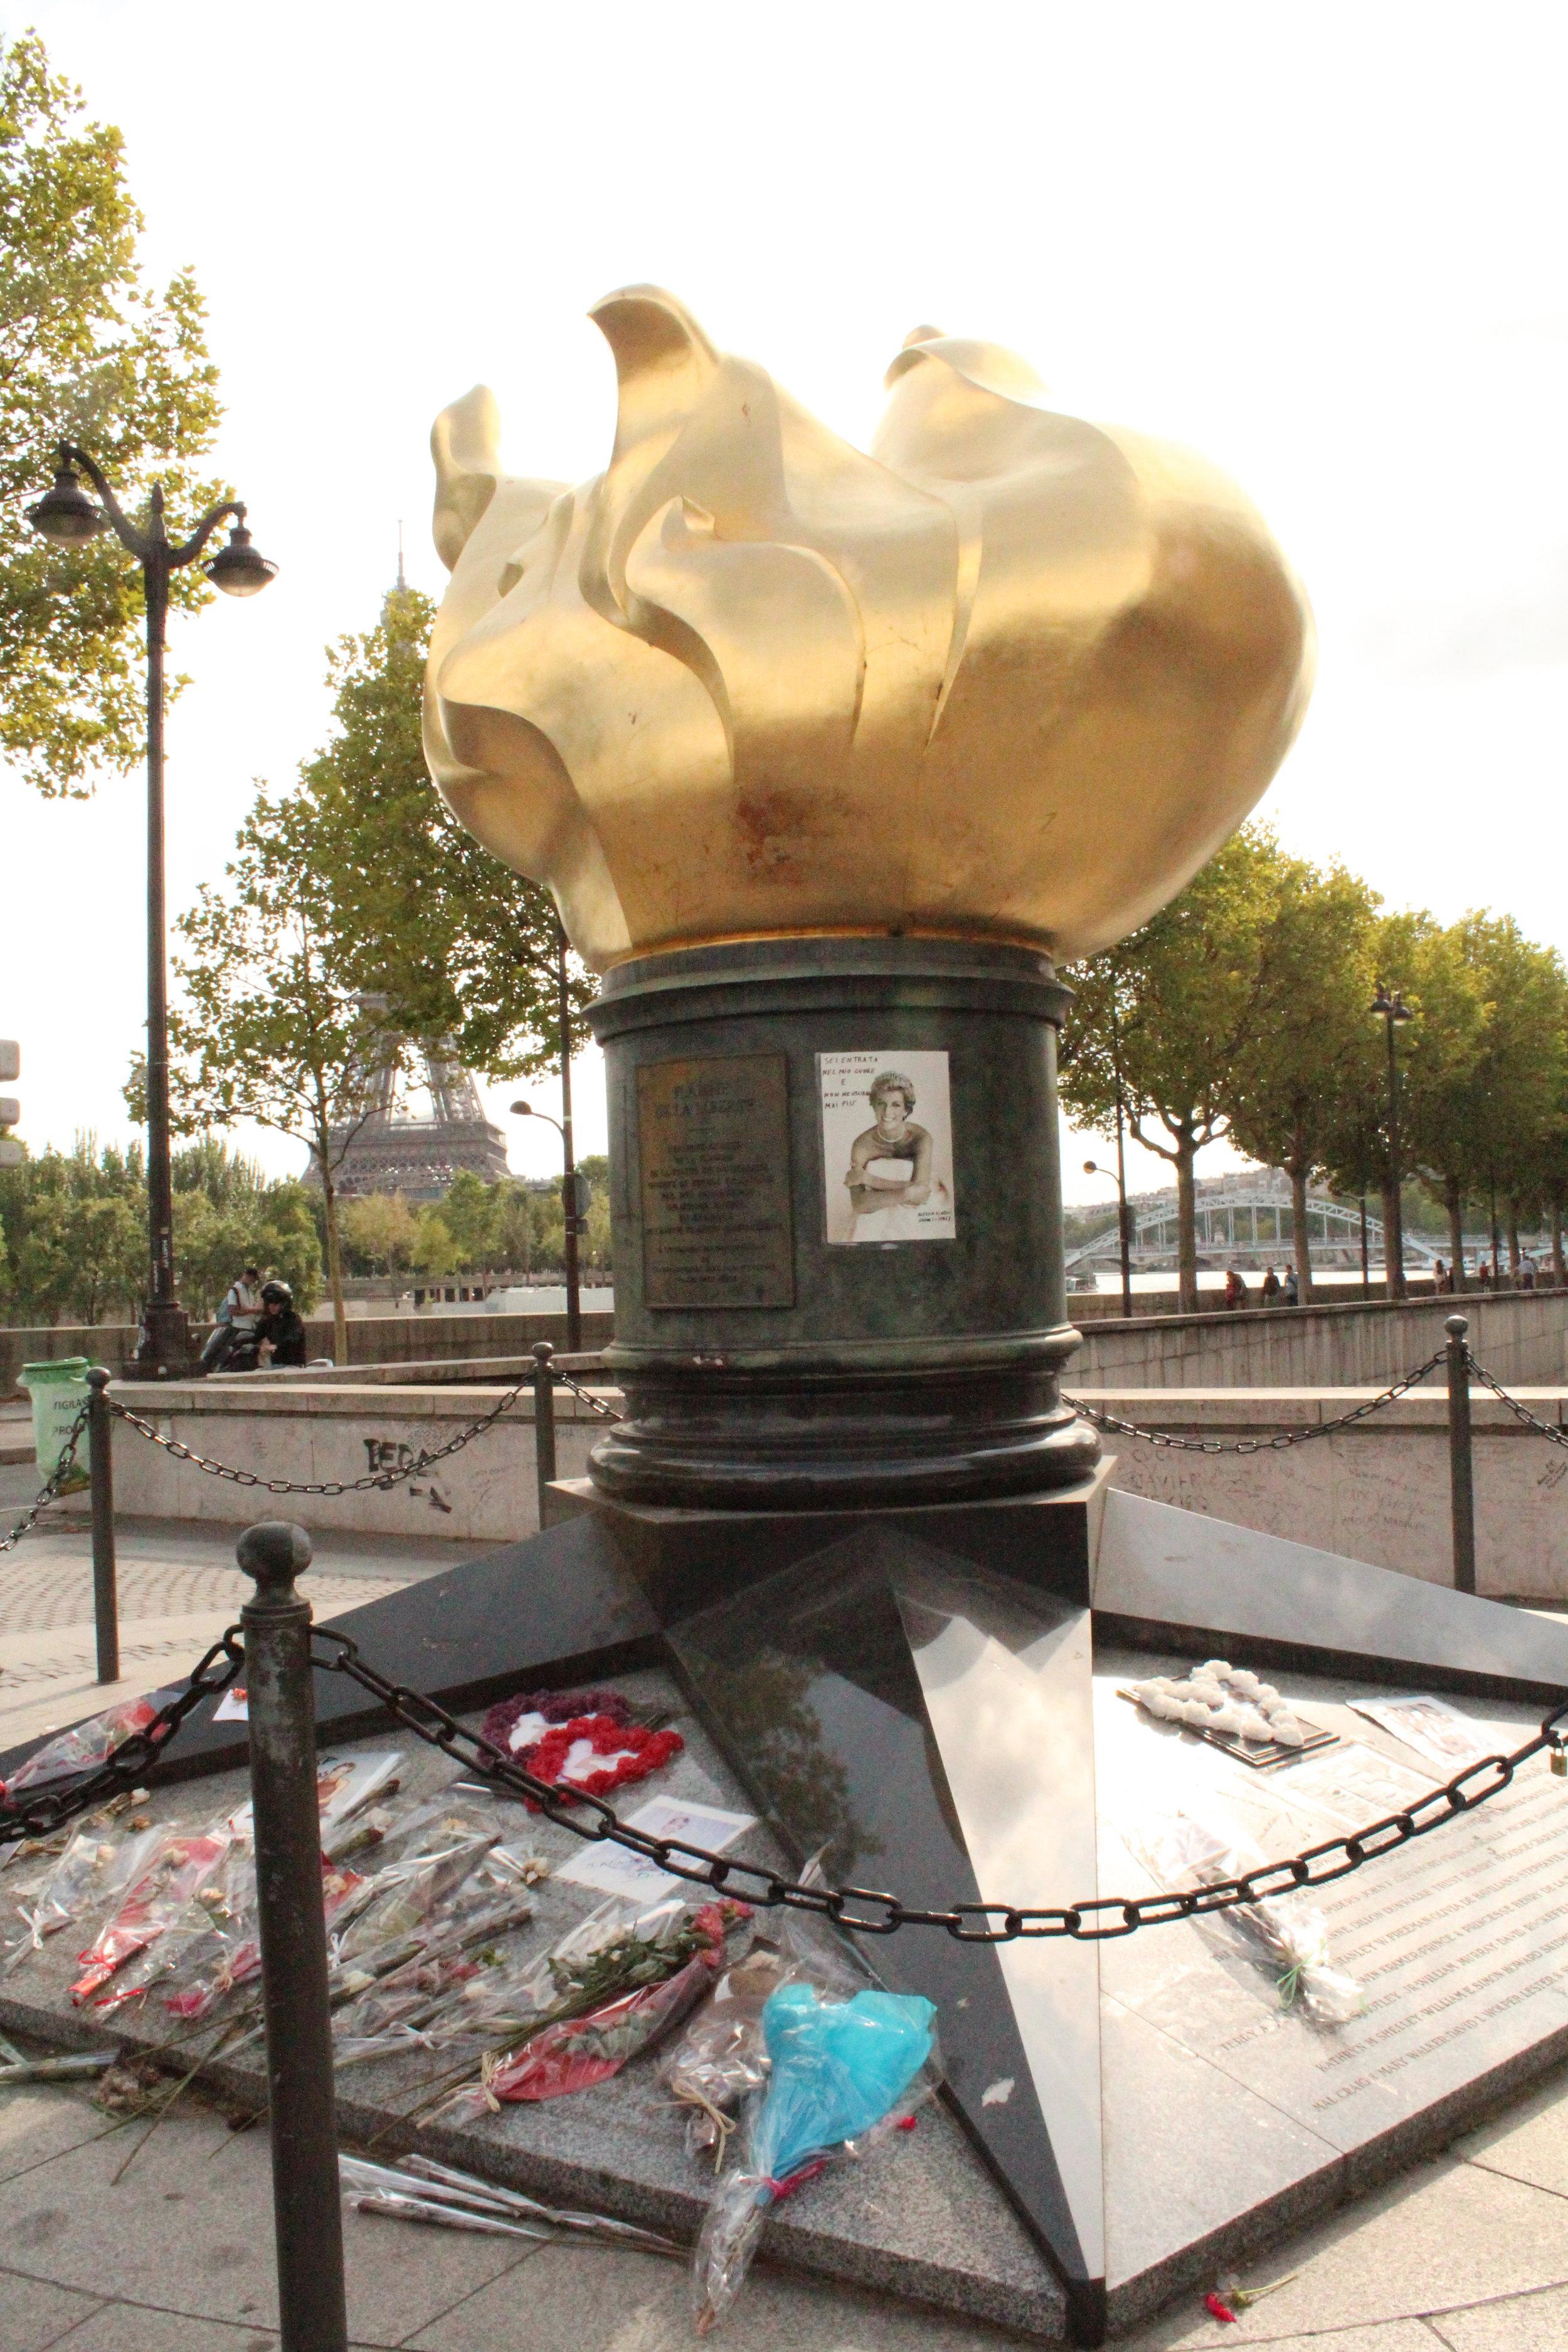 Pont de l'Alma, Paris, Princess Diana memorial